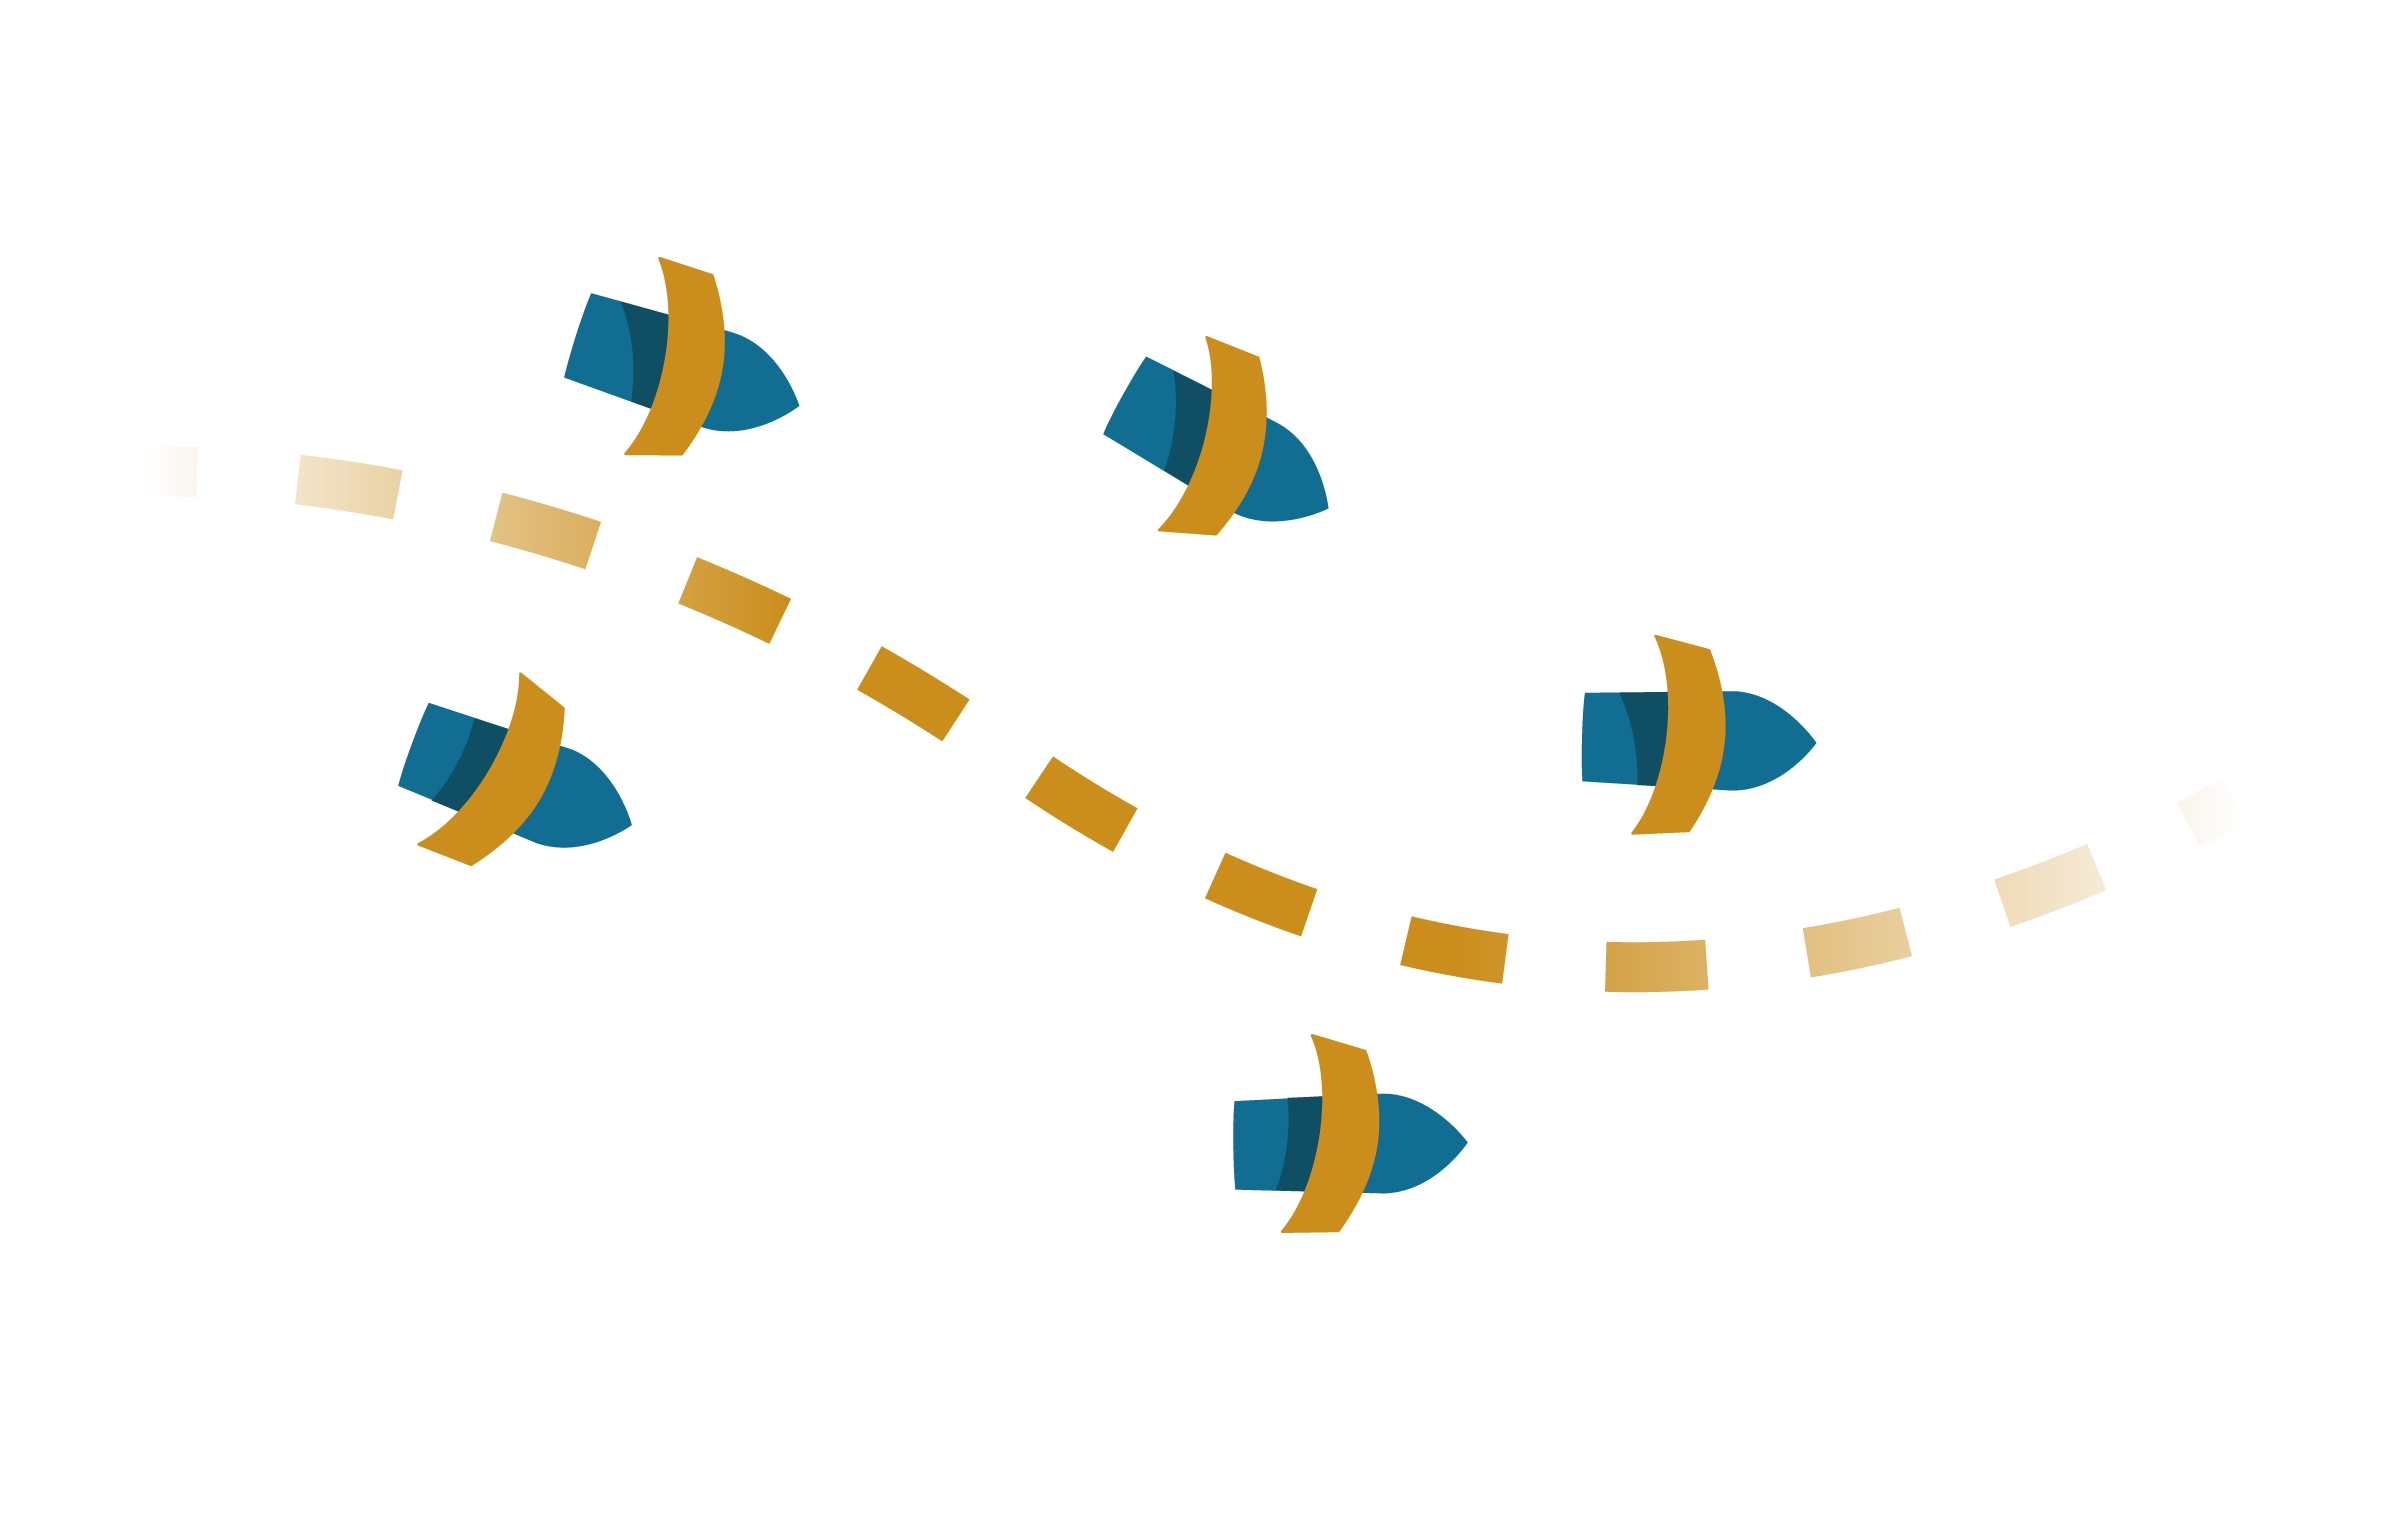 Icon Moderation & Facilitation